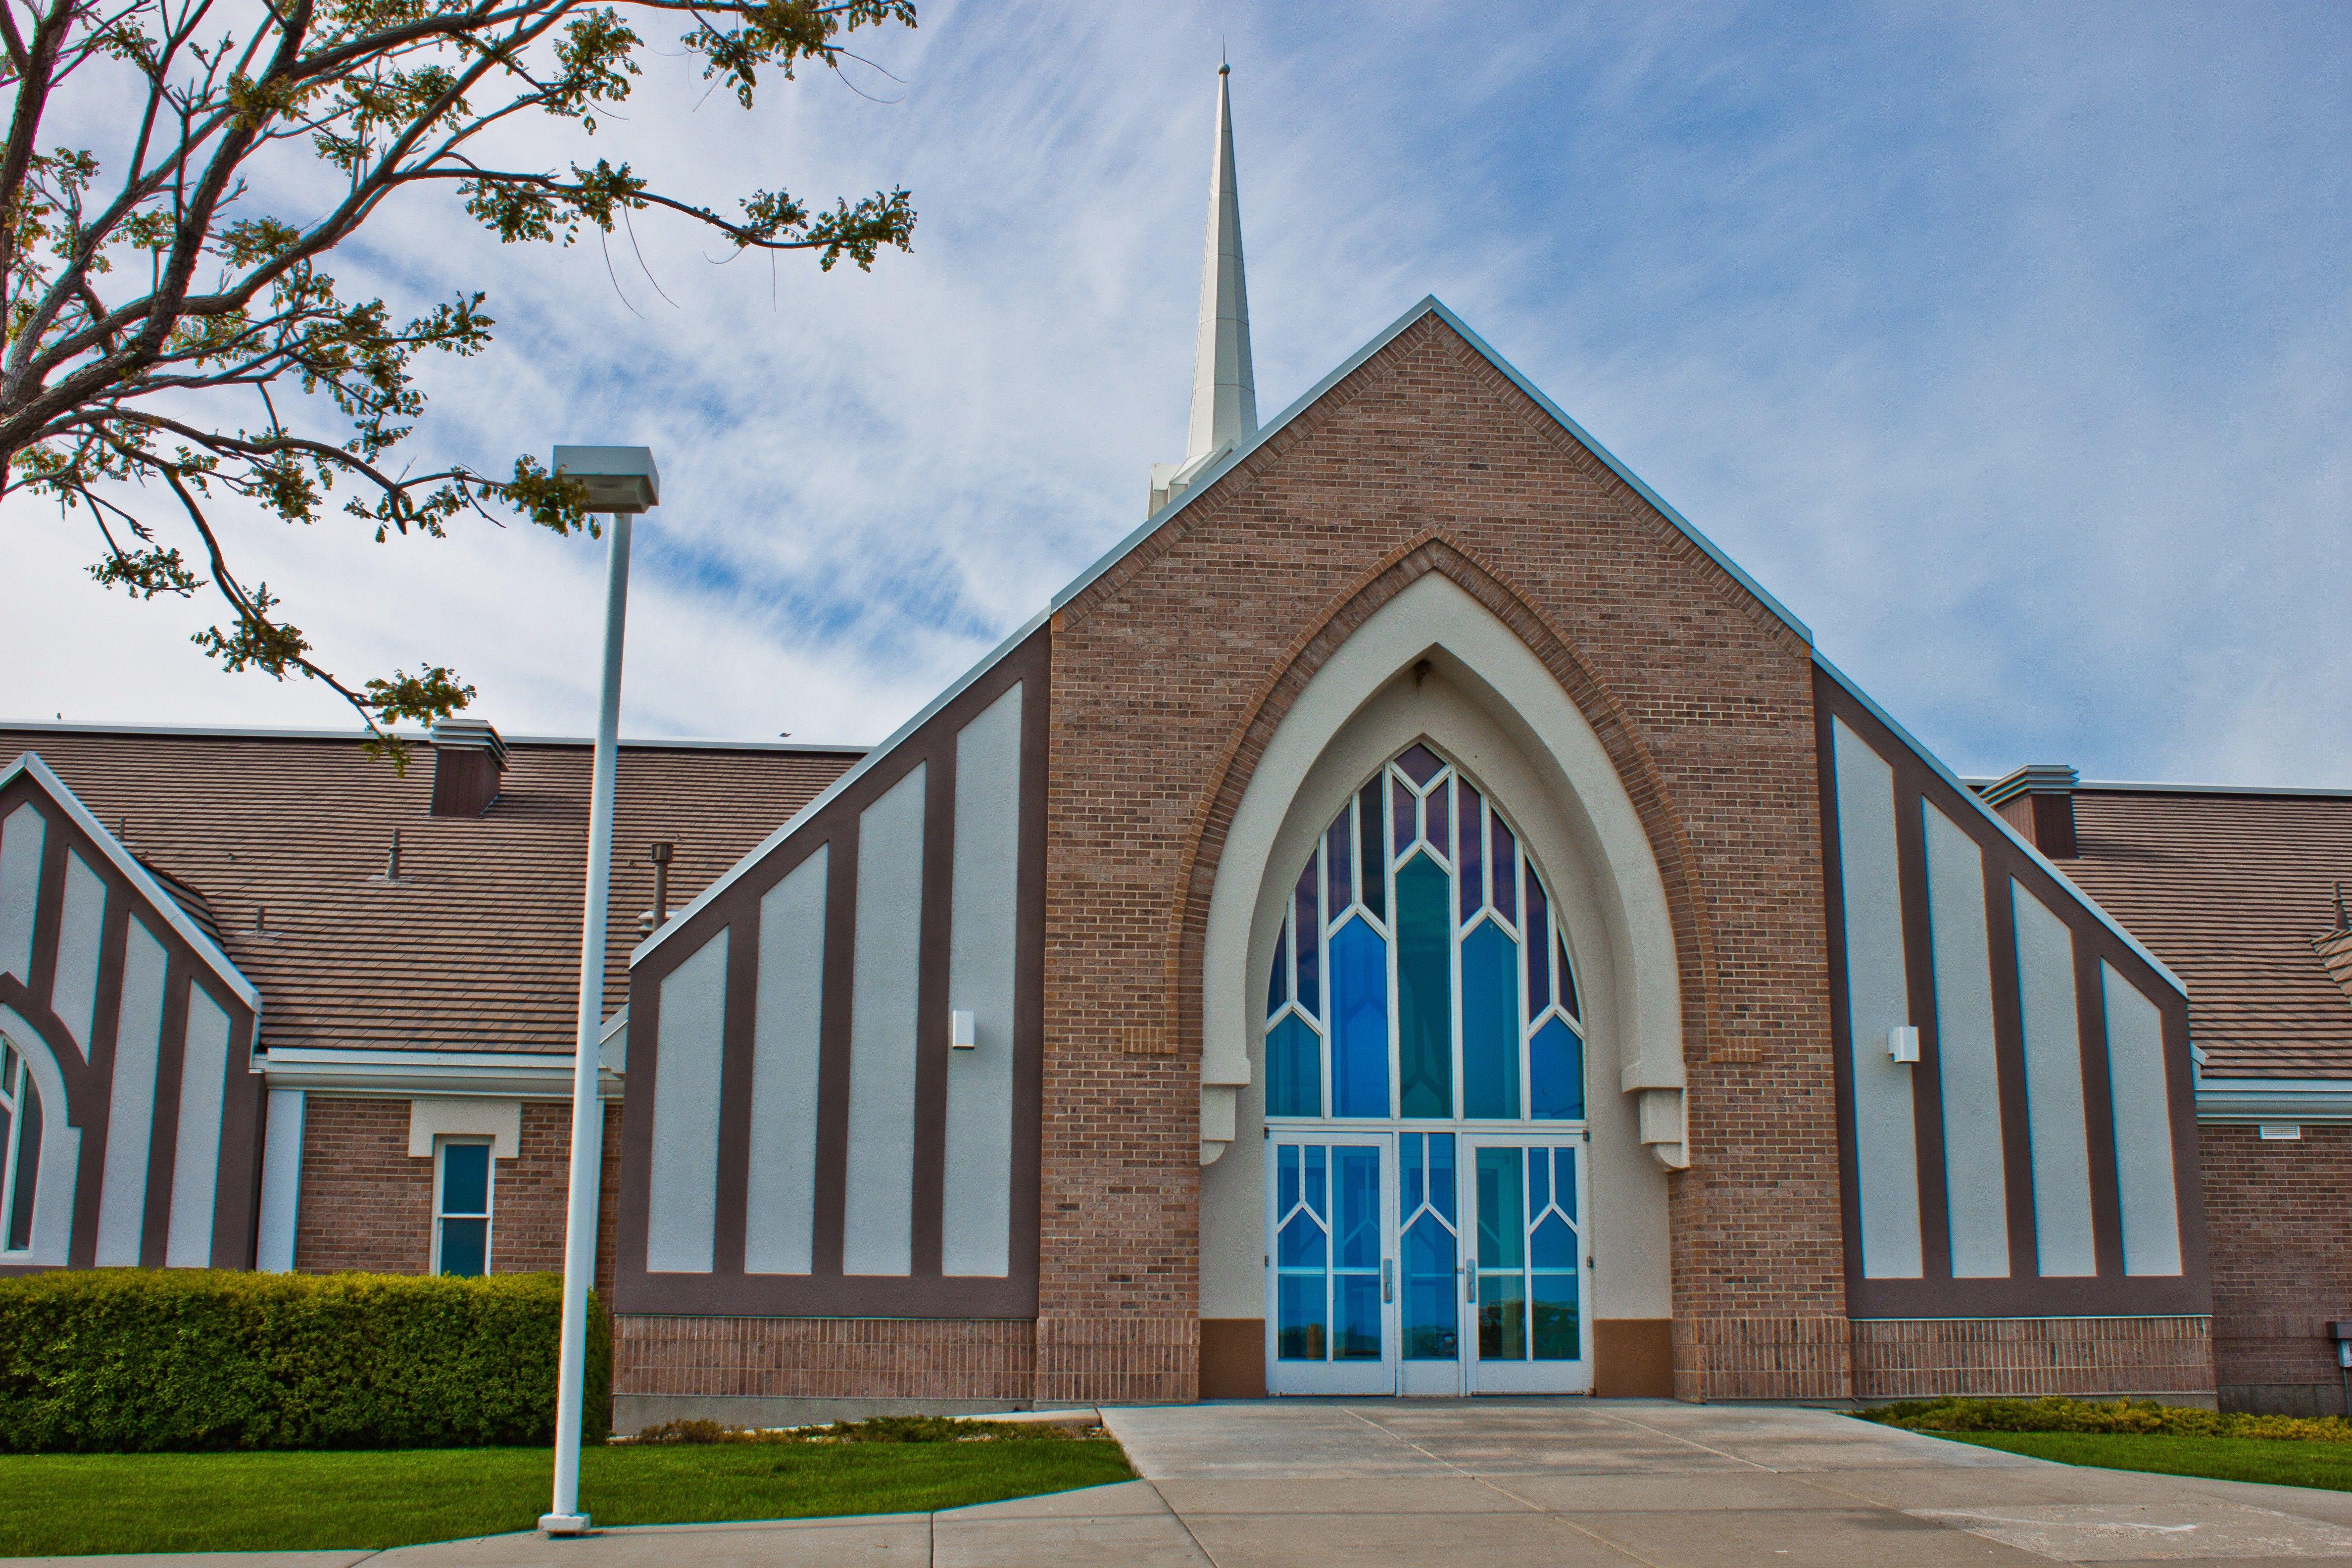 The front view of a chapel in Erda, Utah.